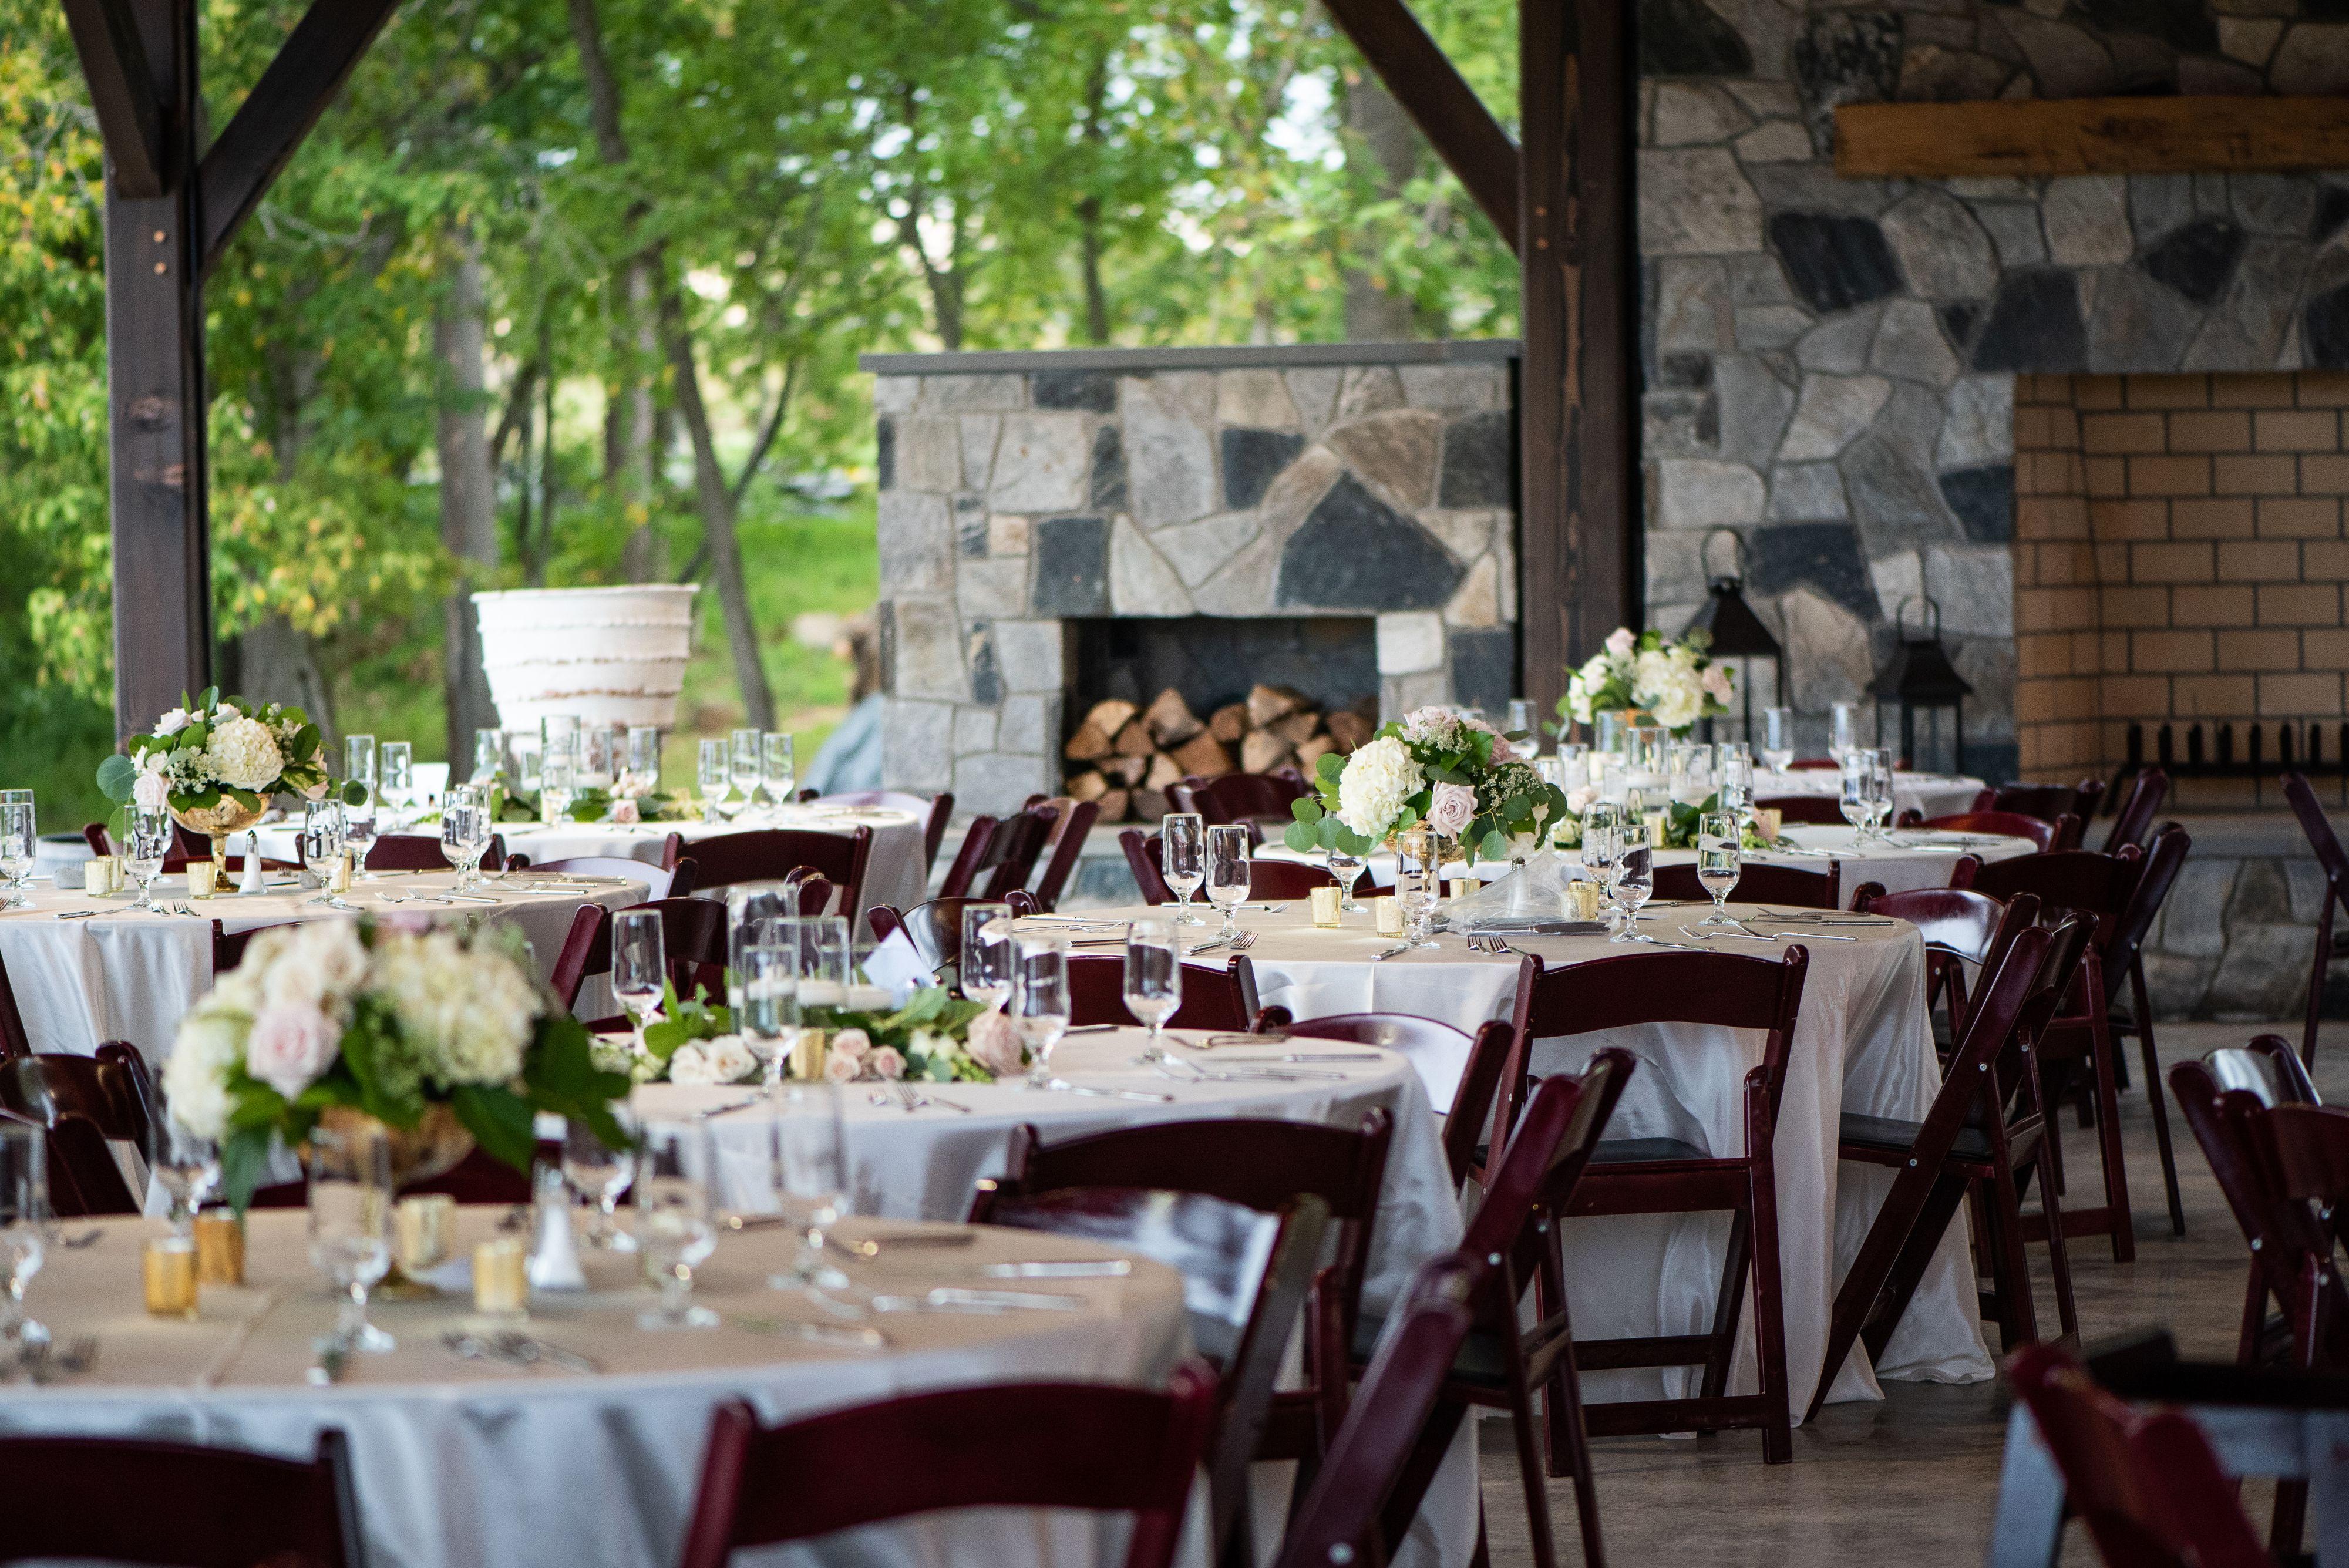 Betsy-&-Jonathan-Cana-Vineyards-Wedding-167.jpg